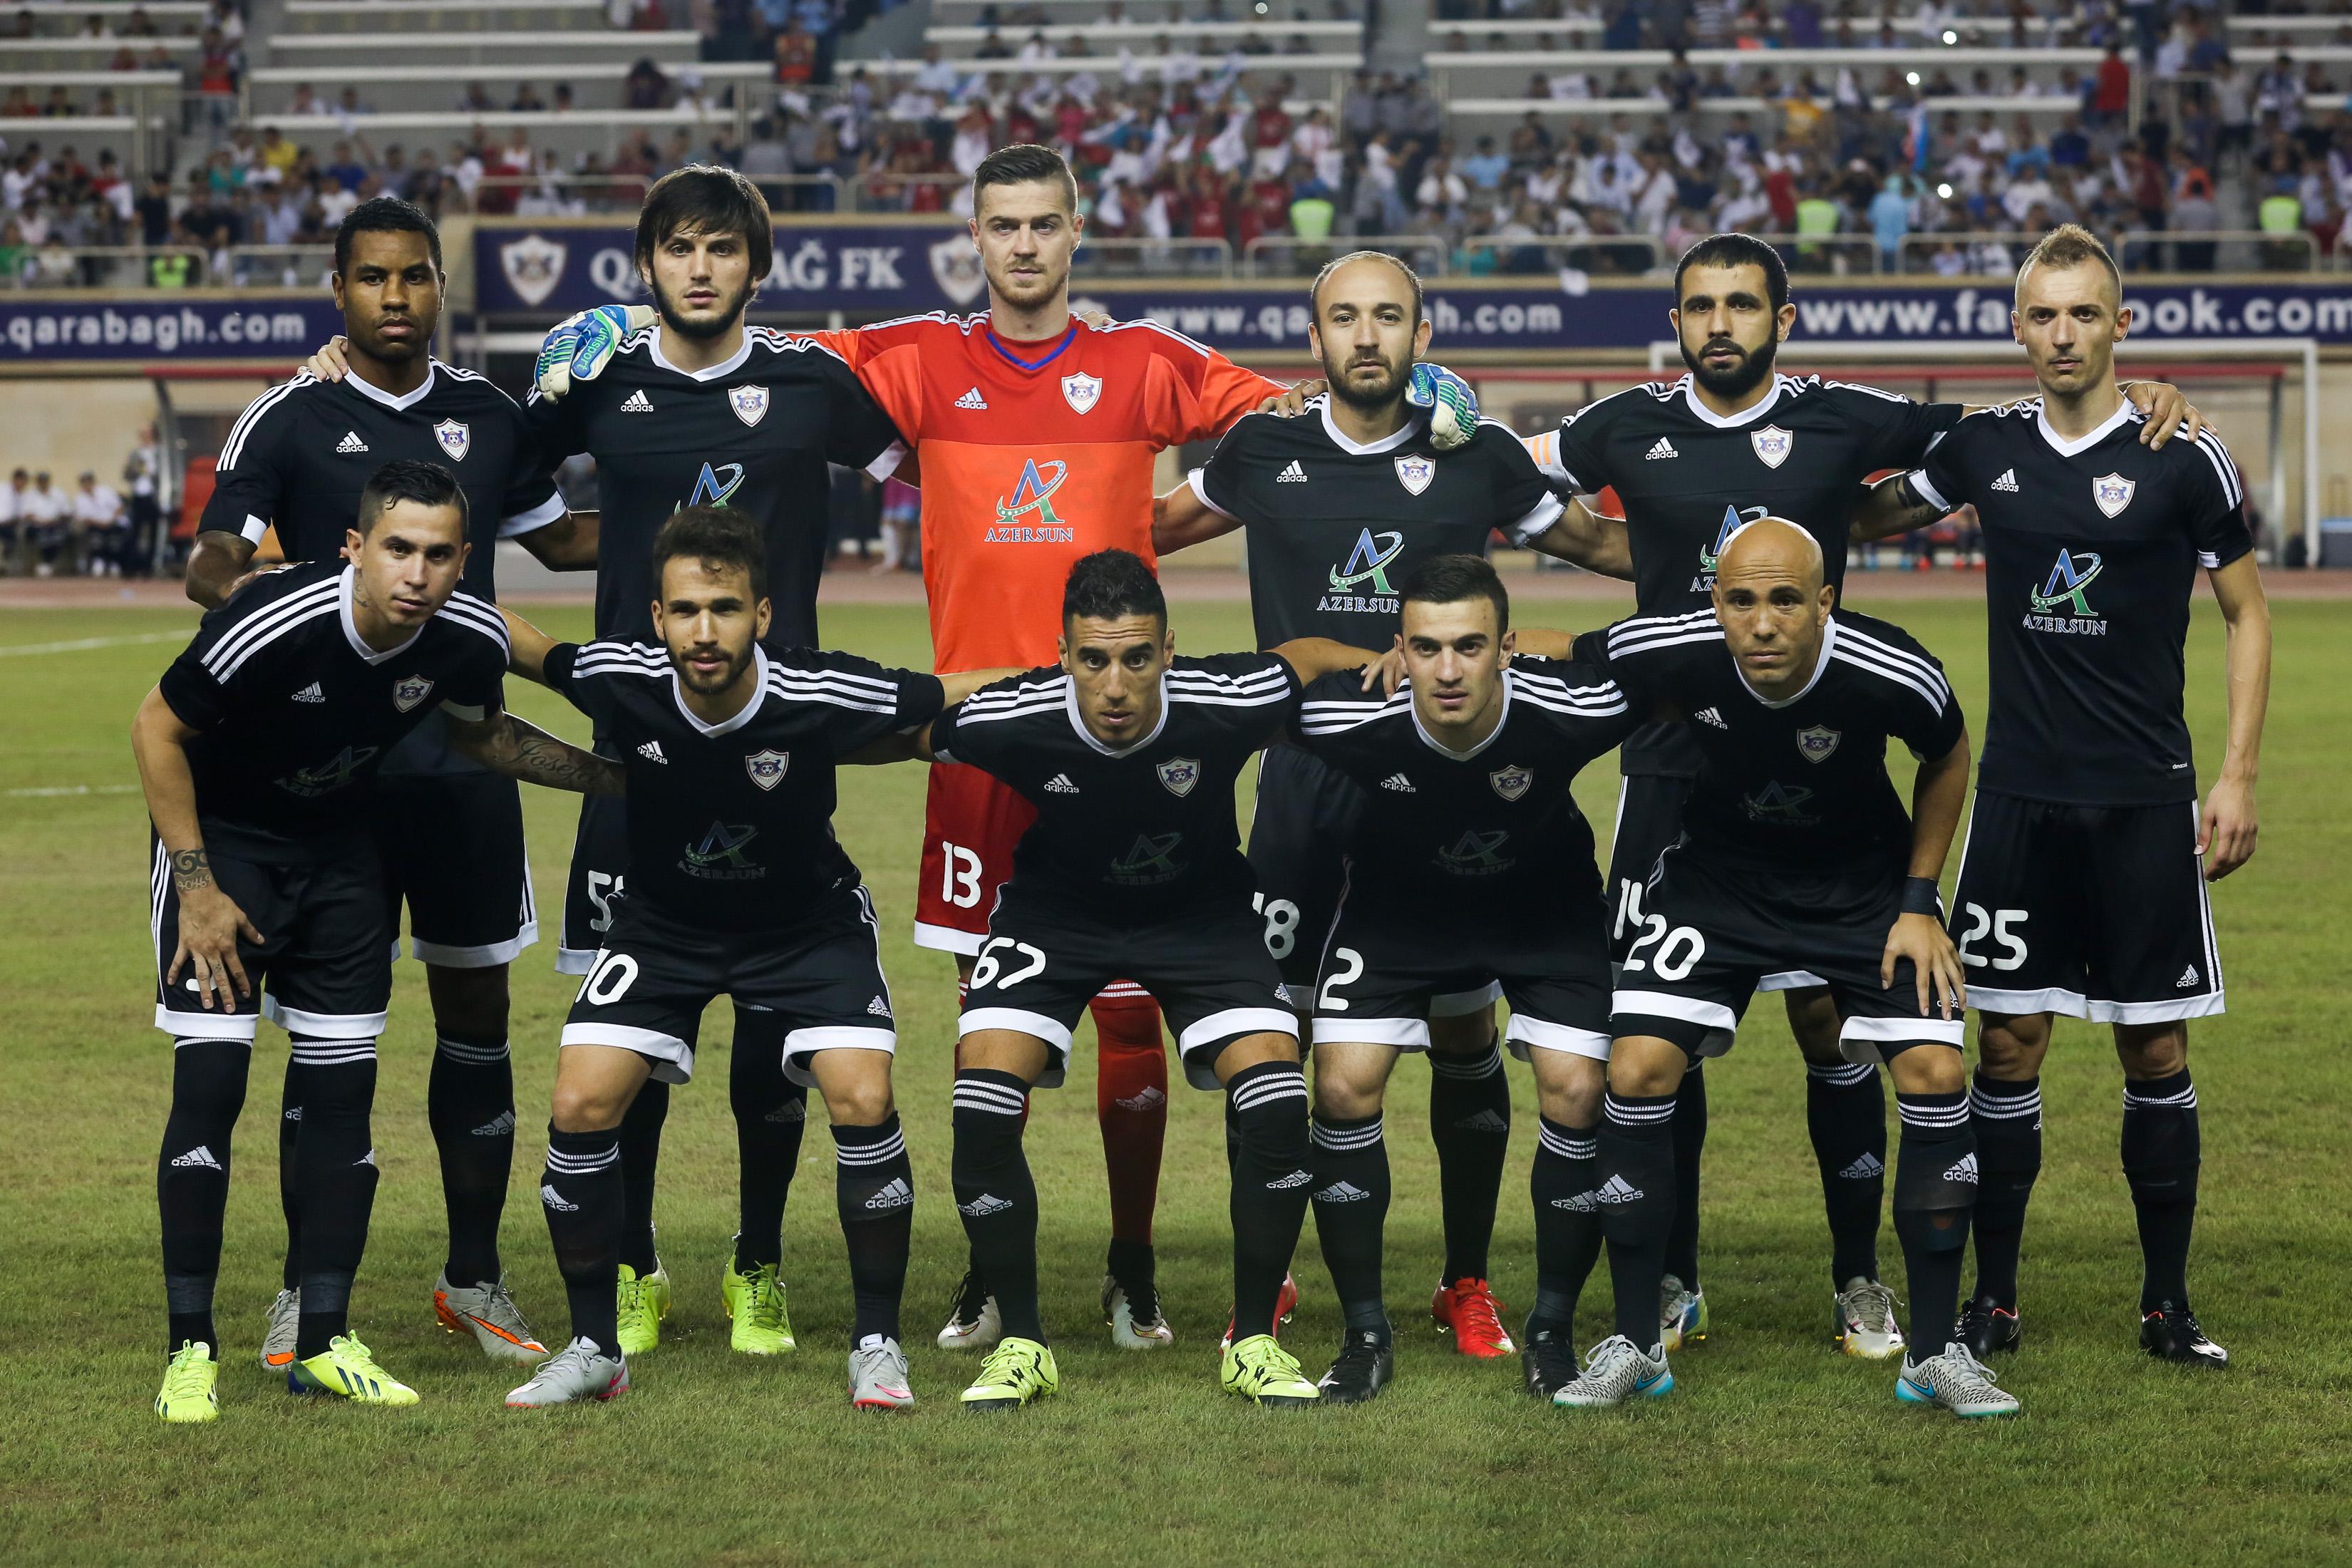 Qarabag FK team start the game  during the UEFA Champions